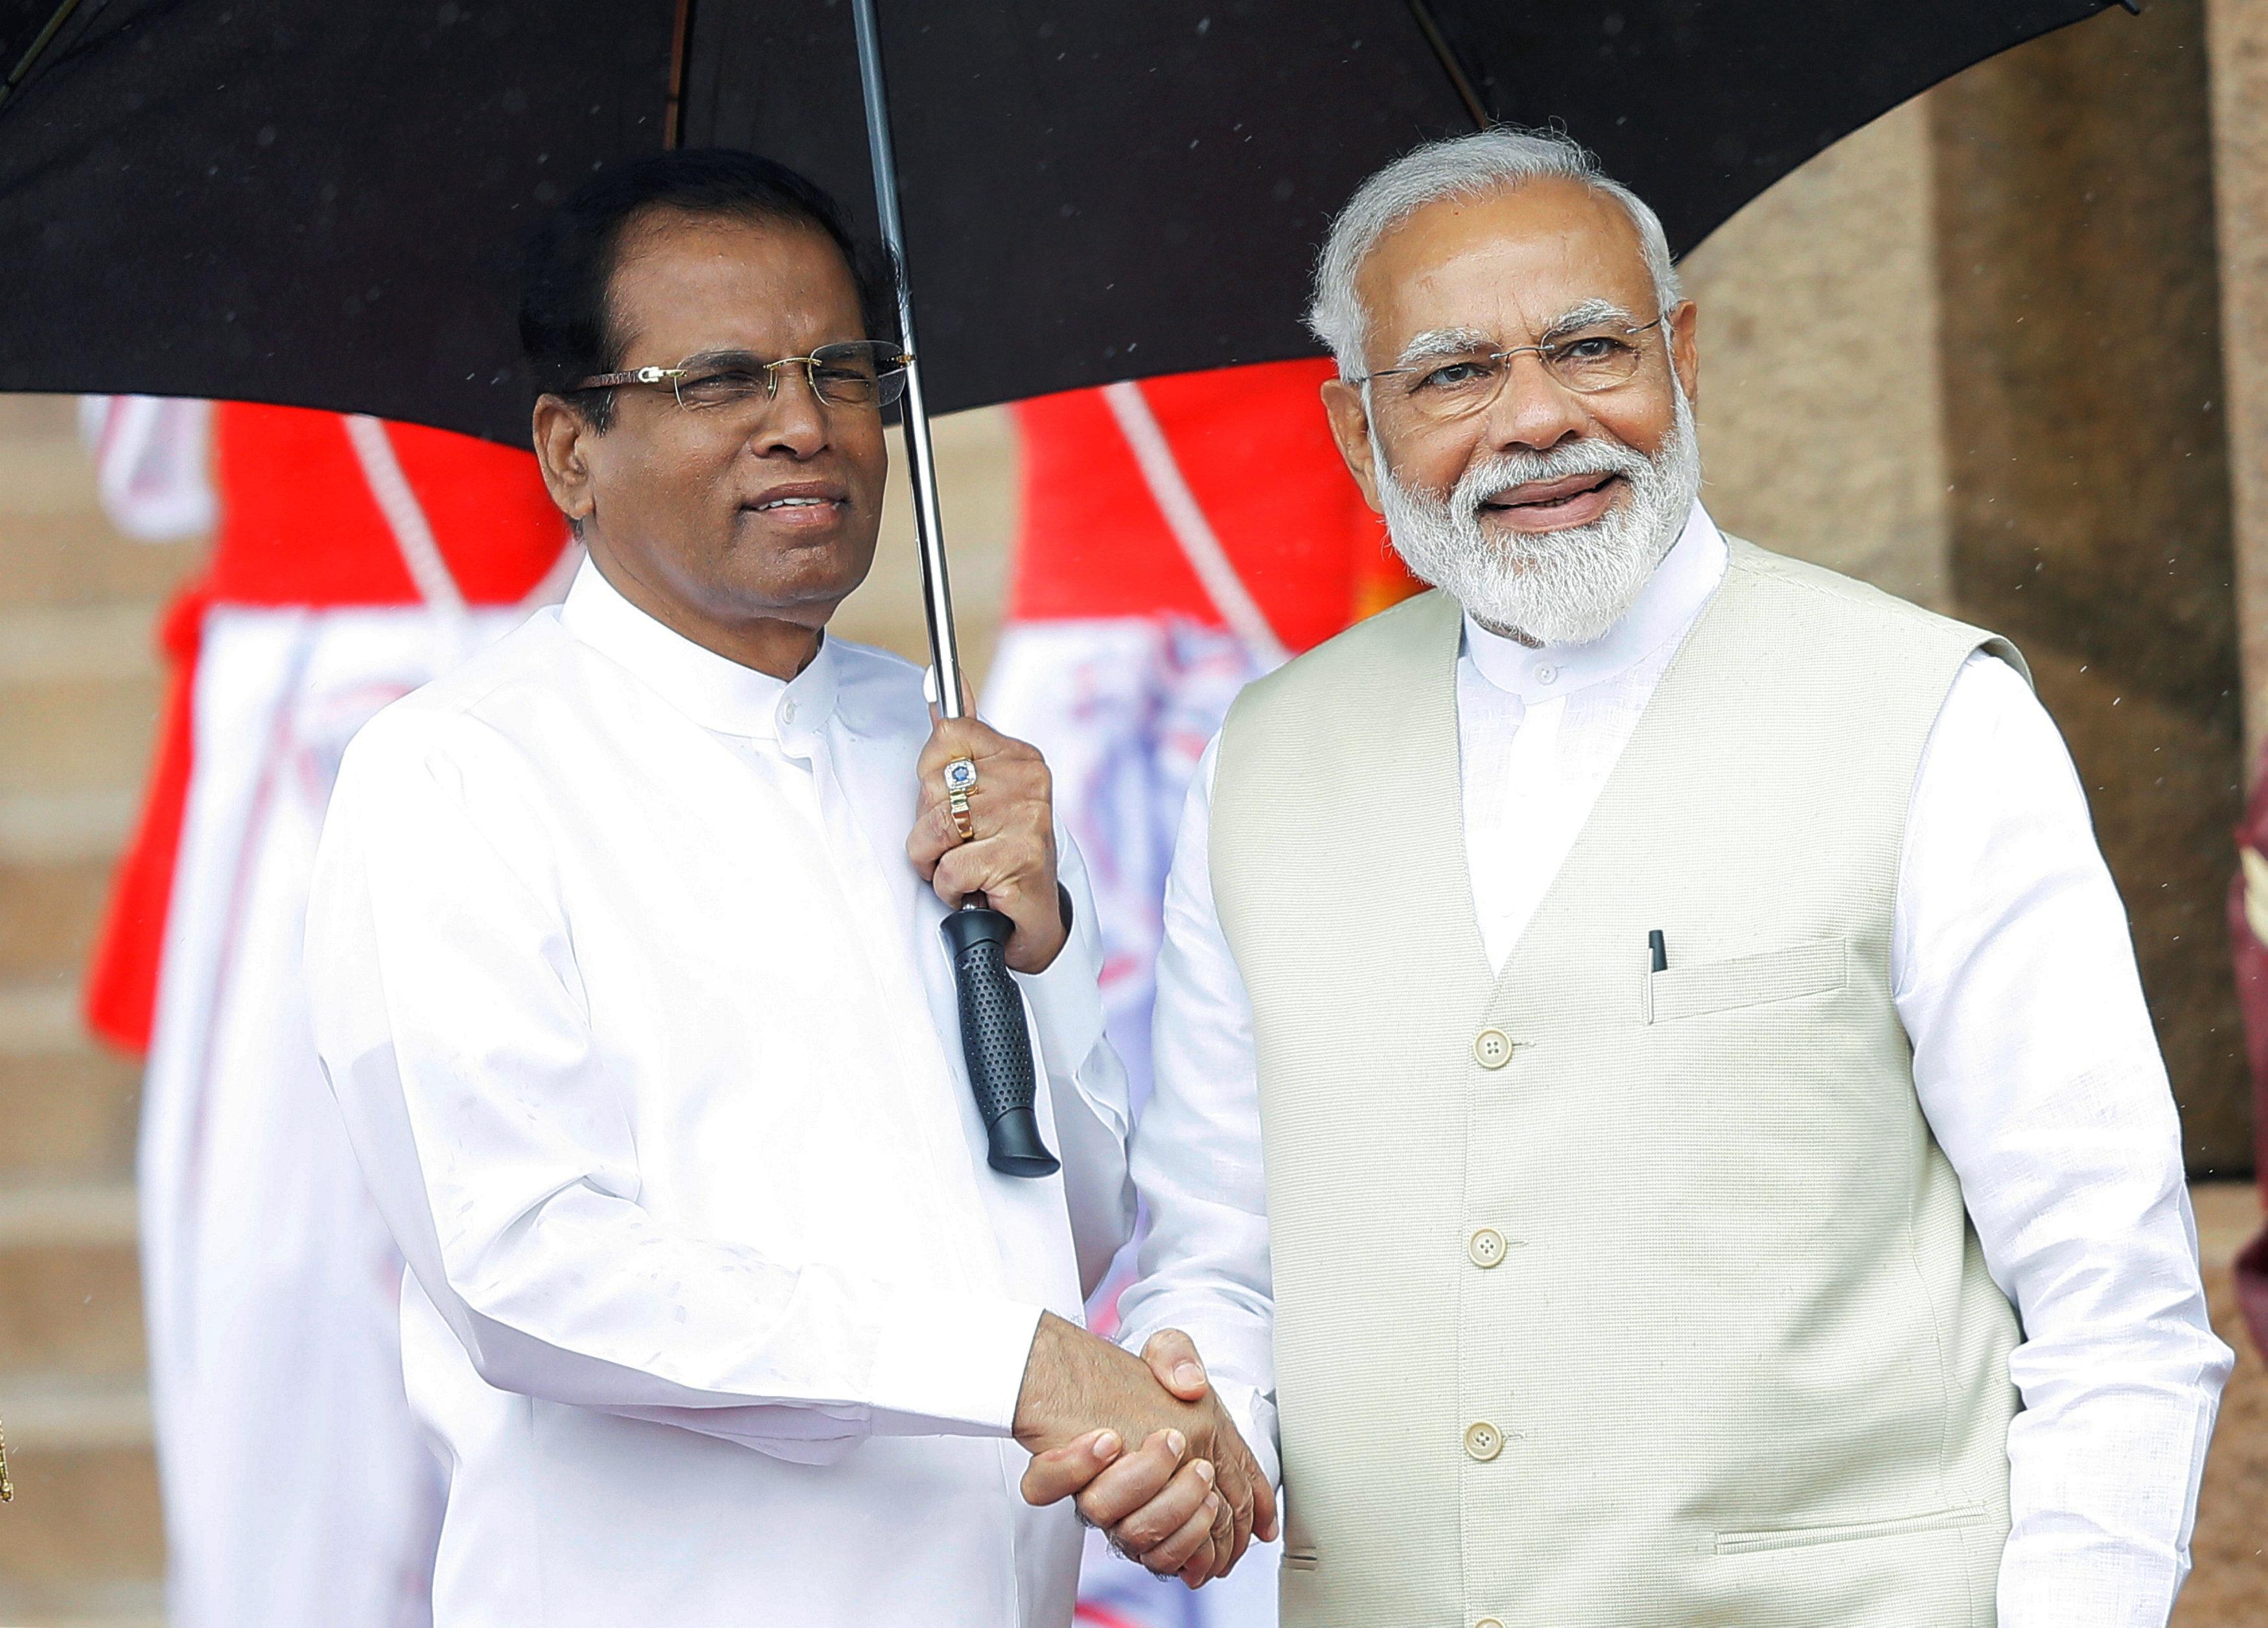 India's Prime Minister Narendra Modi shakes hands with Sri Lanka's President Maithripala Sirisena during his welcome ceremony at the Presidential Secretariat in Colombo, Sri Lanka, June 9, 2019. REUTERS/ Dinuka Liyanawatte